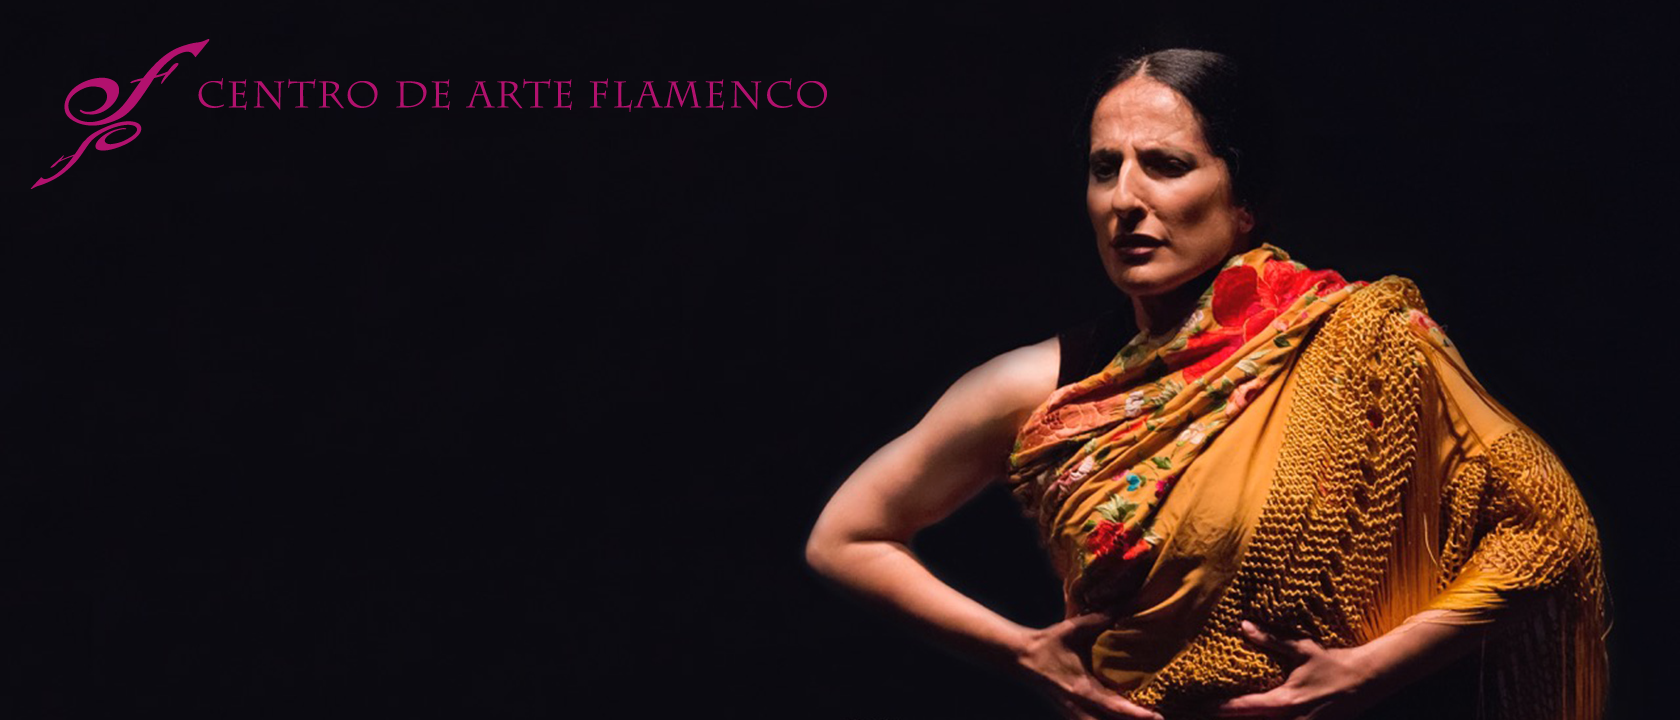 Flamencoworkshops mit Mercedes Ruíz: Februar 2018